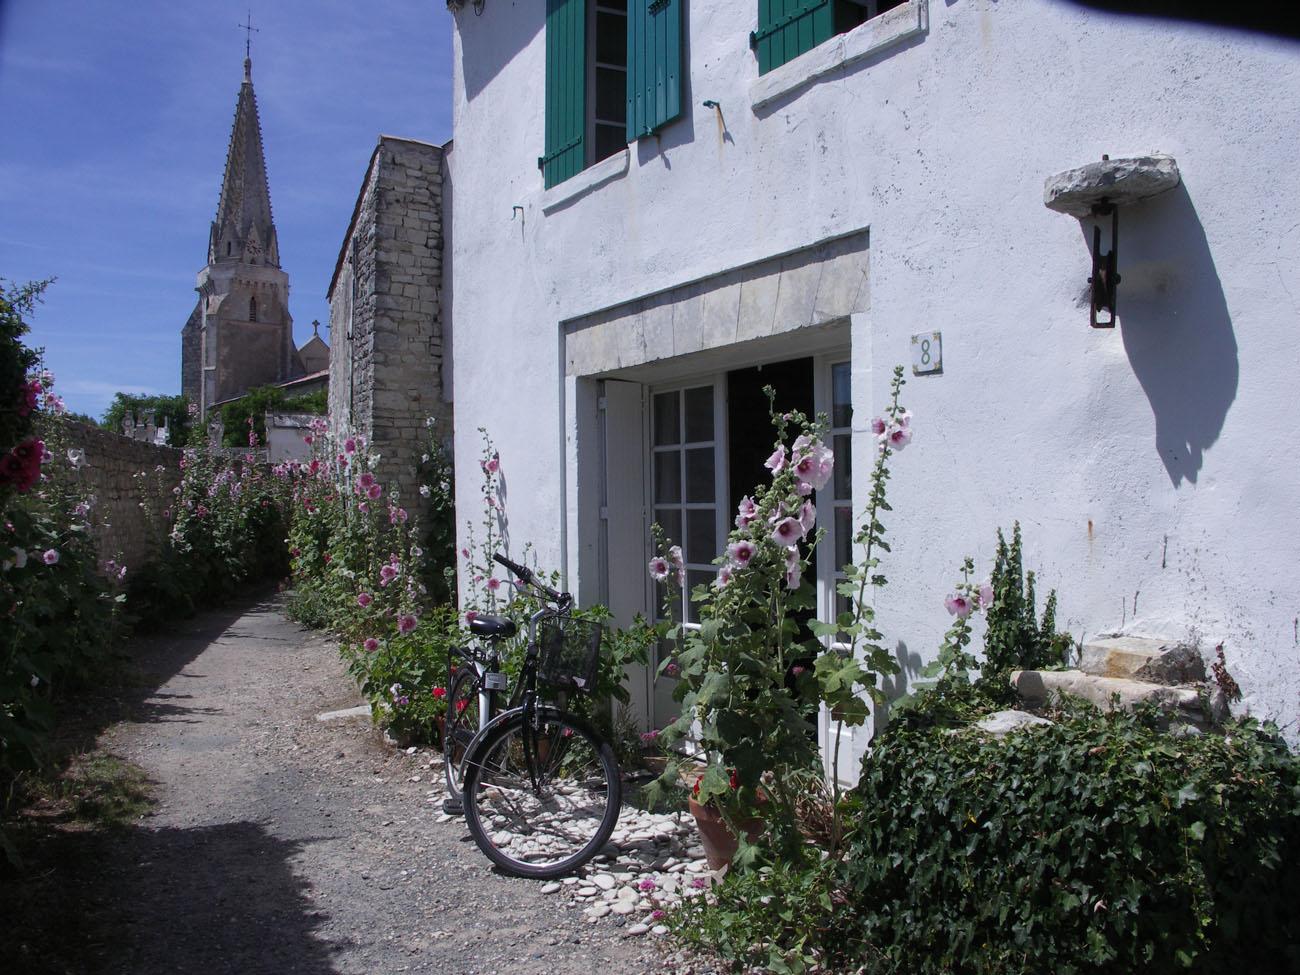 Location Maison Ile de Ré - Marceane - Façade 2